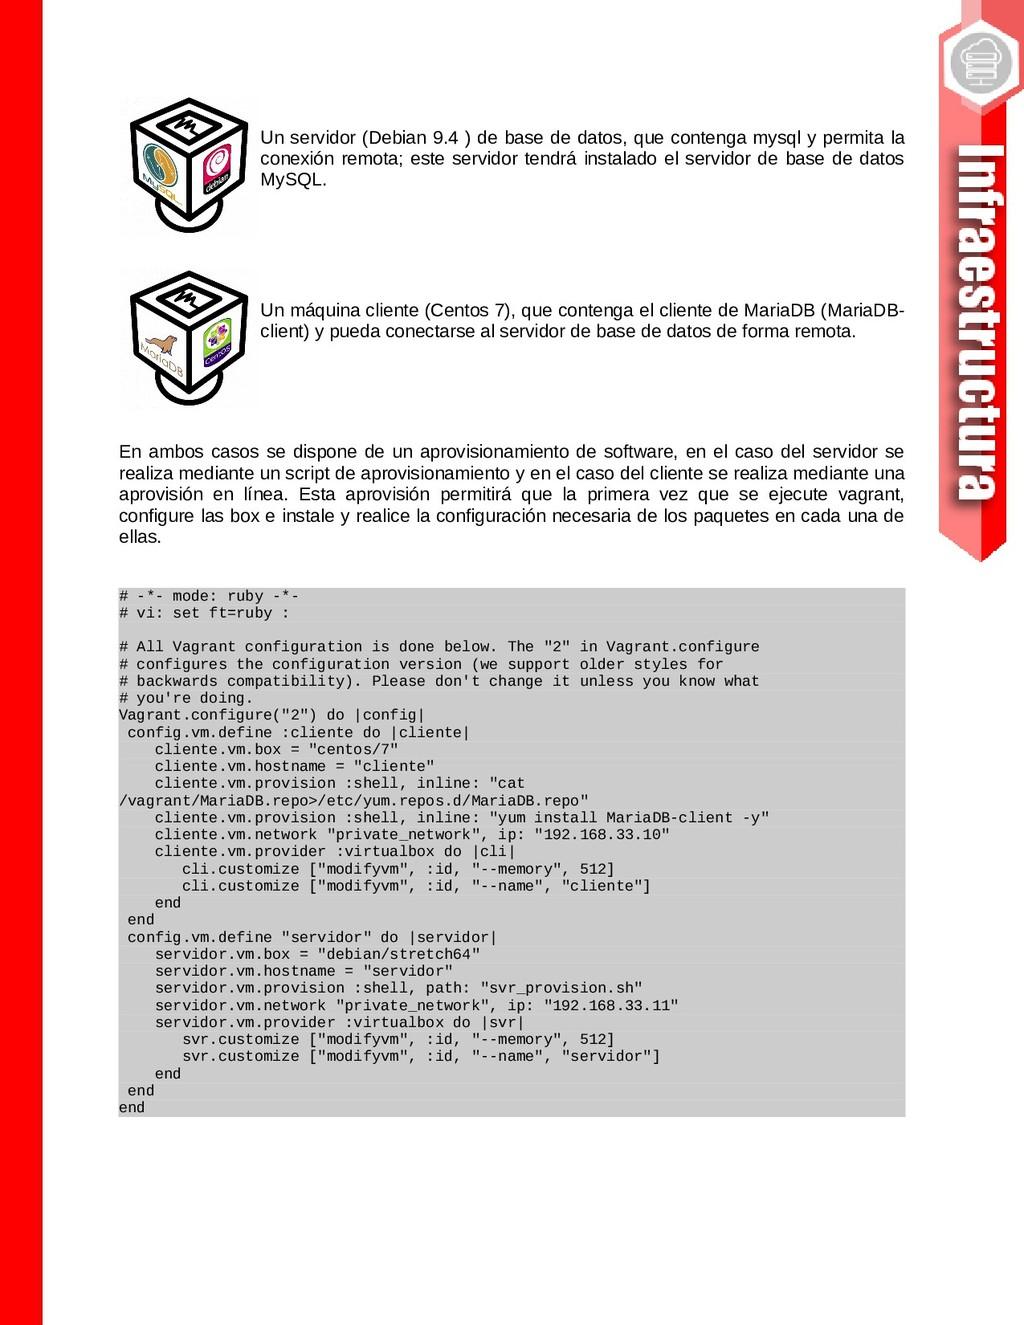 Un servidor (Debian 9.4 ) de base de datos, que...